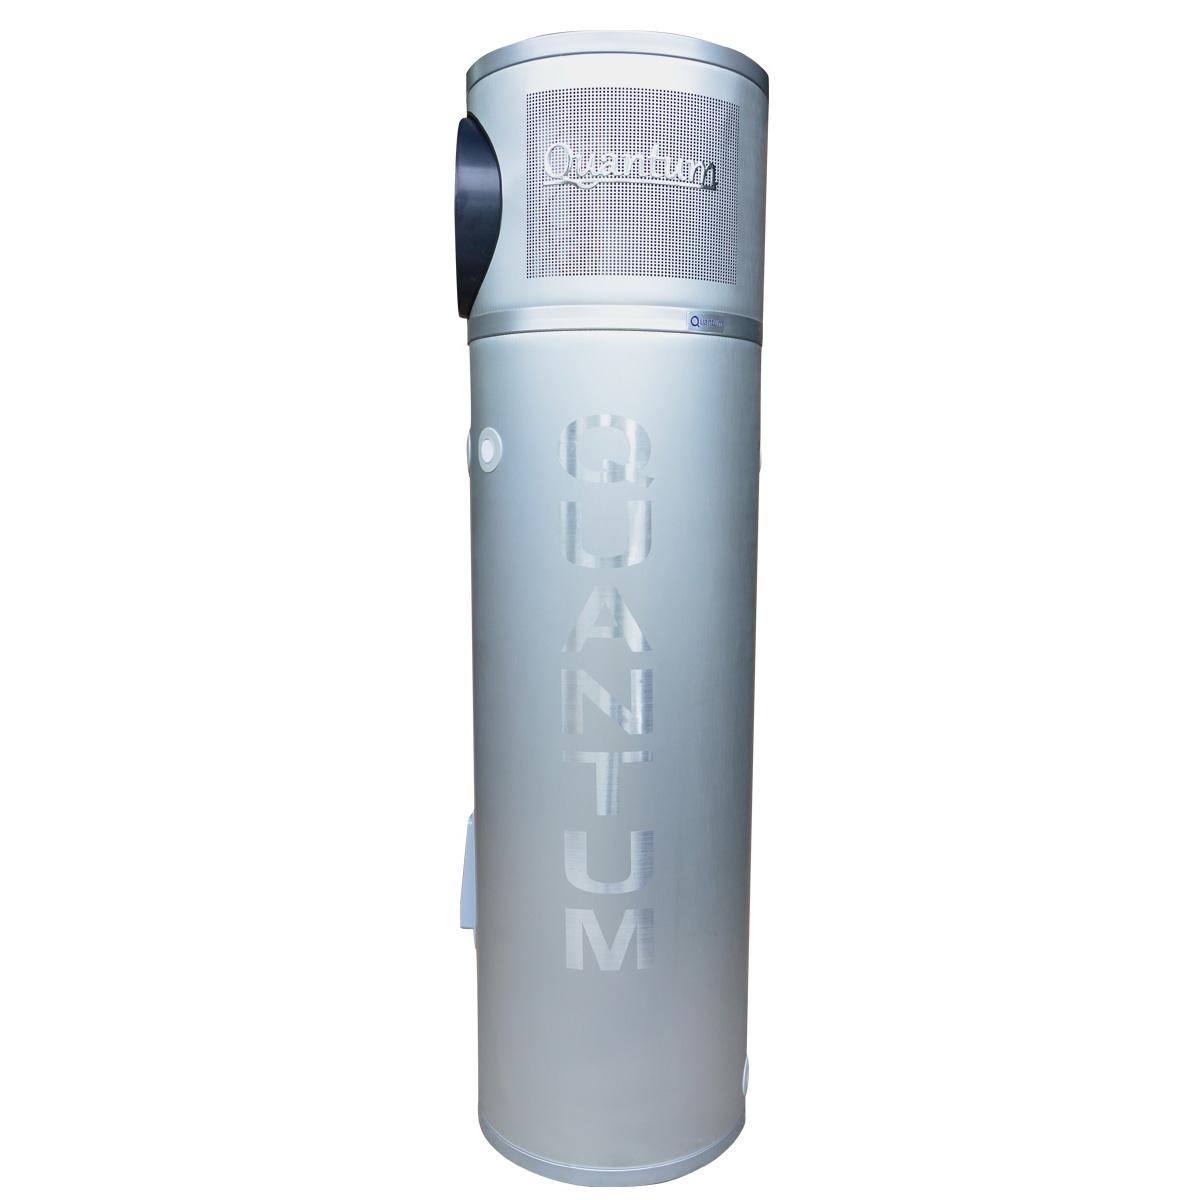 Quantum AC6 200L Compact Solar Heat Pump Water Heater